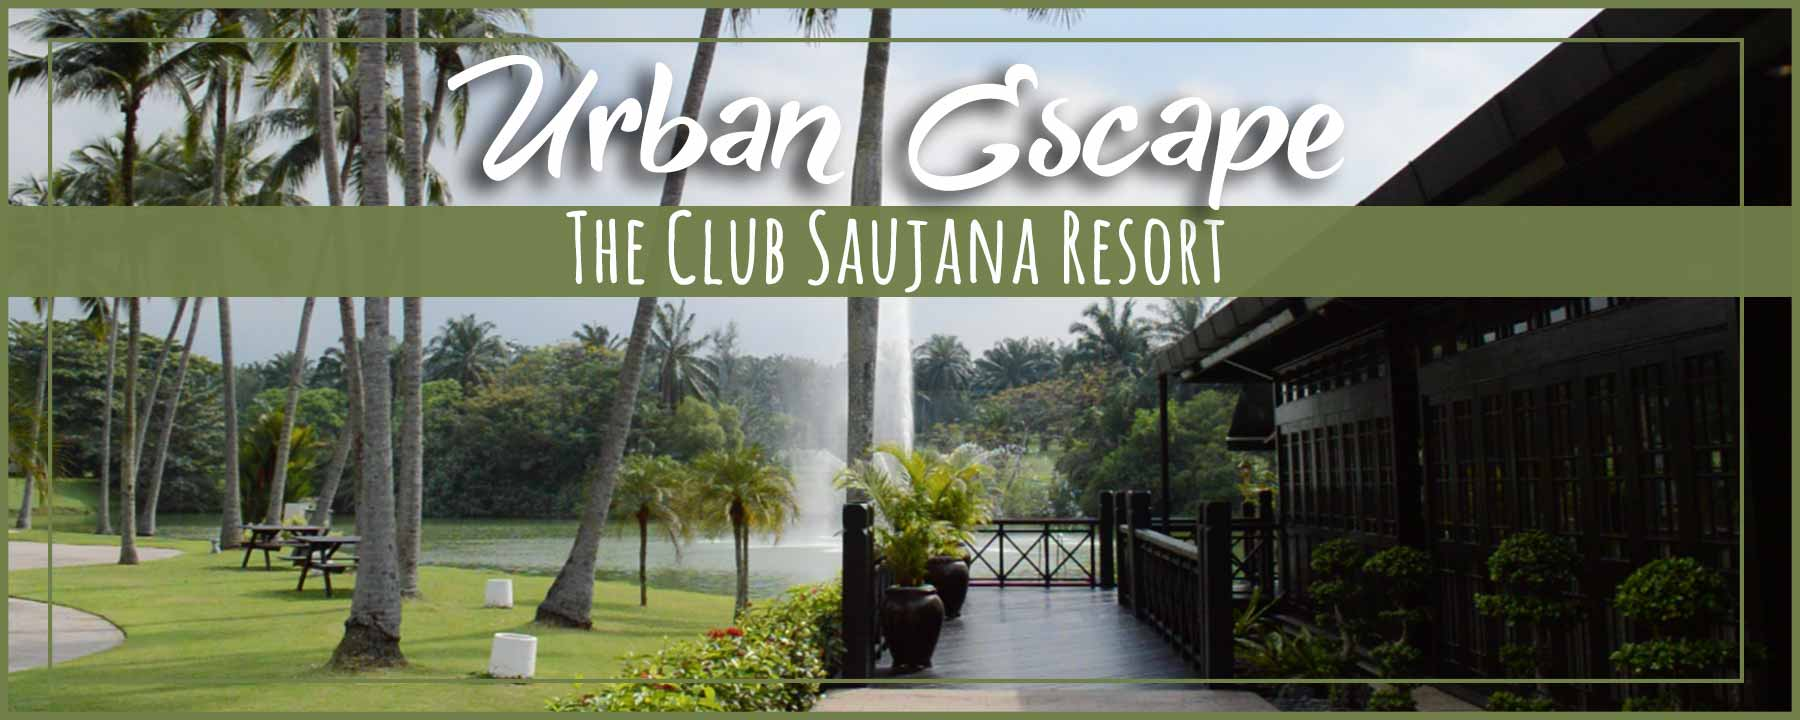 Foodie Stay at The Club Saujana Resort